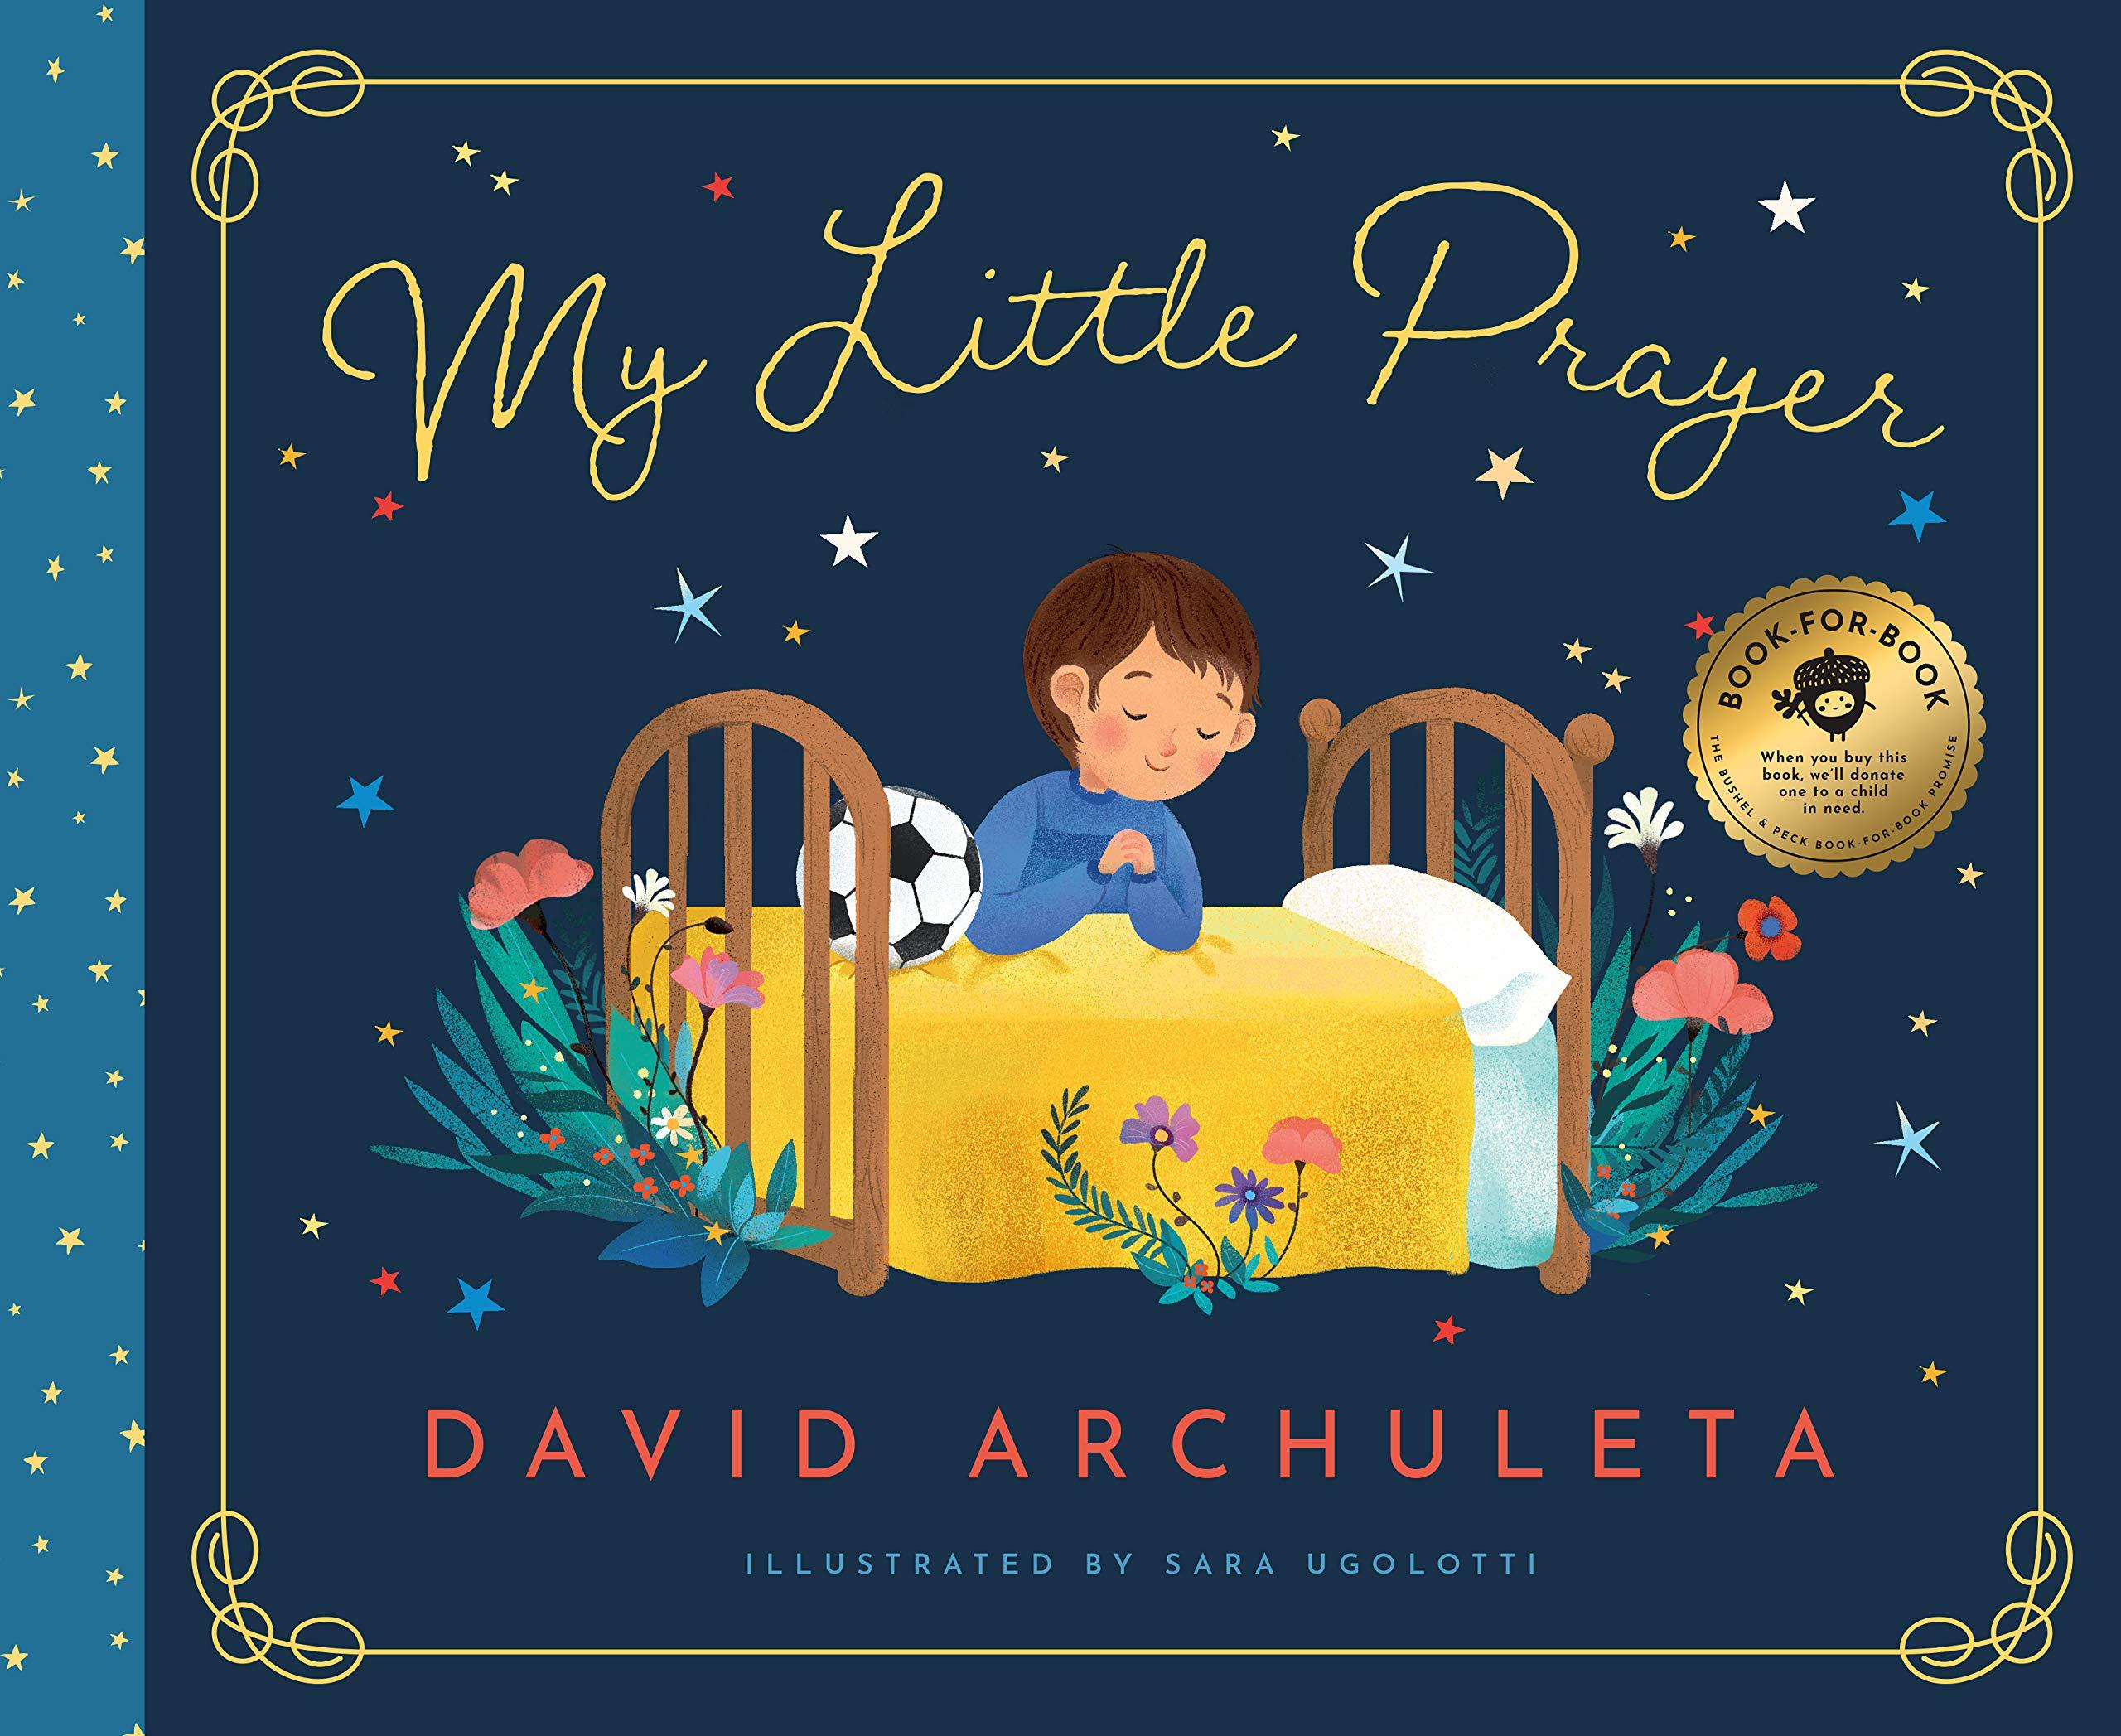 David Archuleta - My Little Prayer